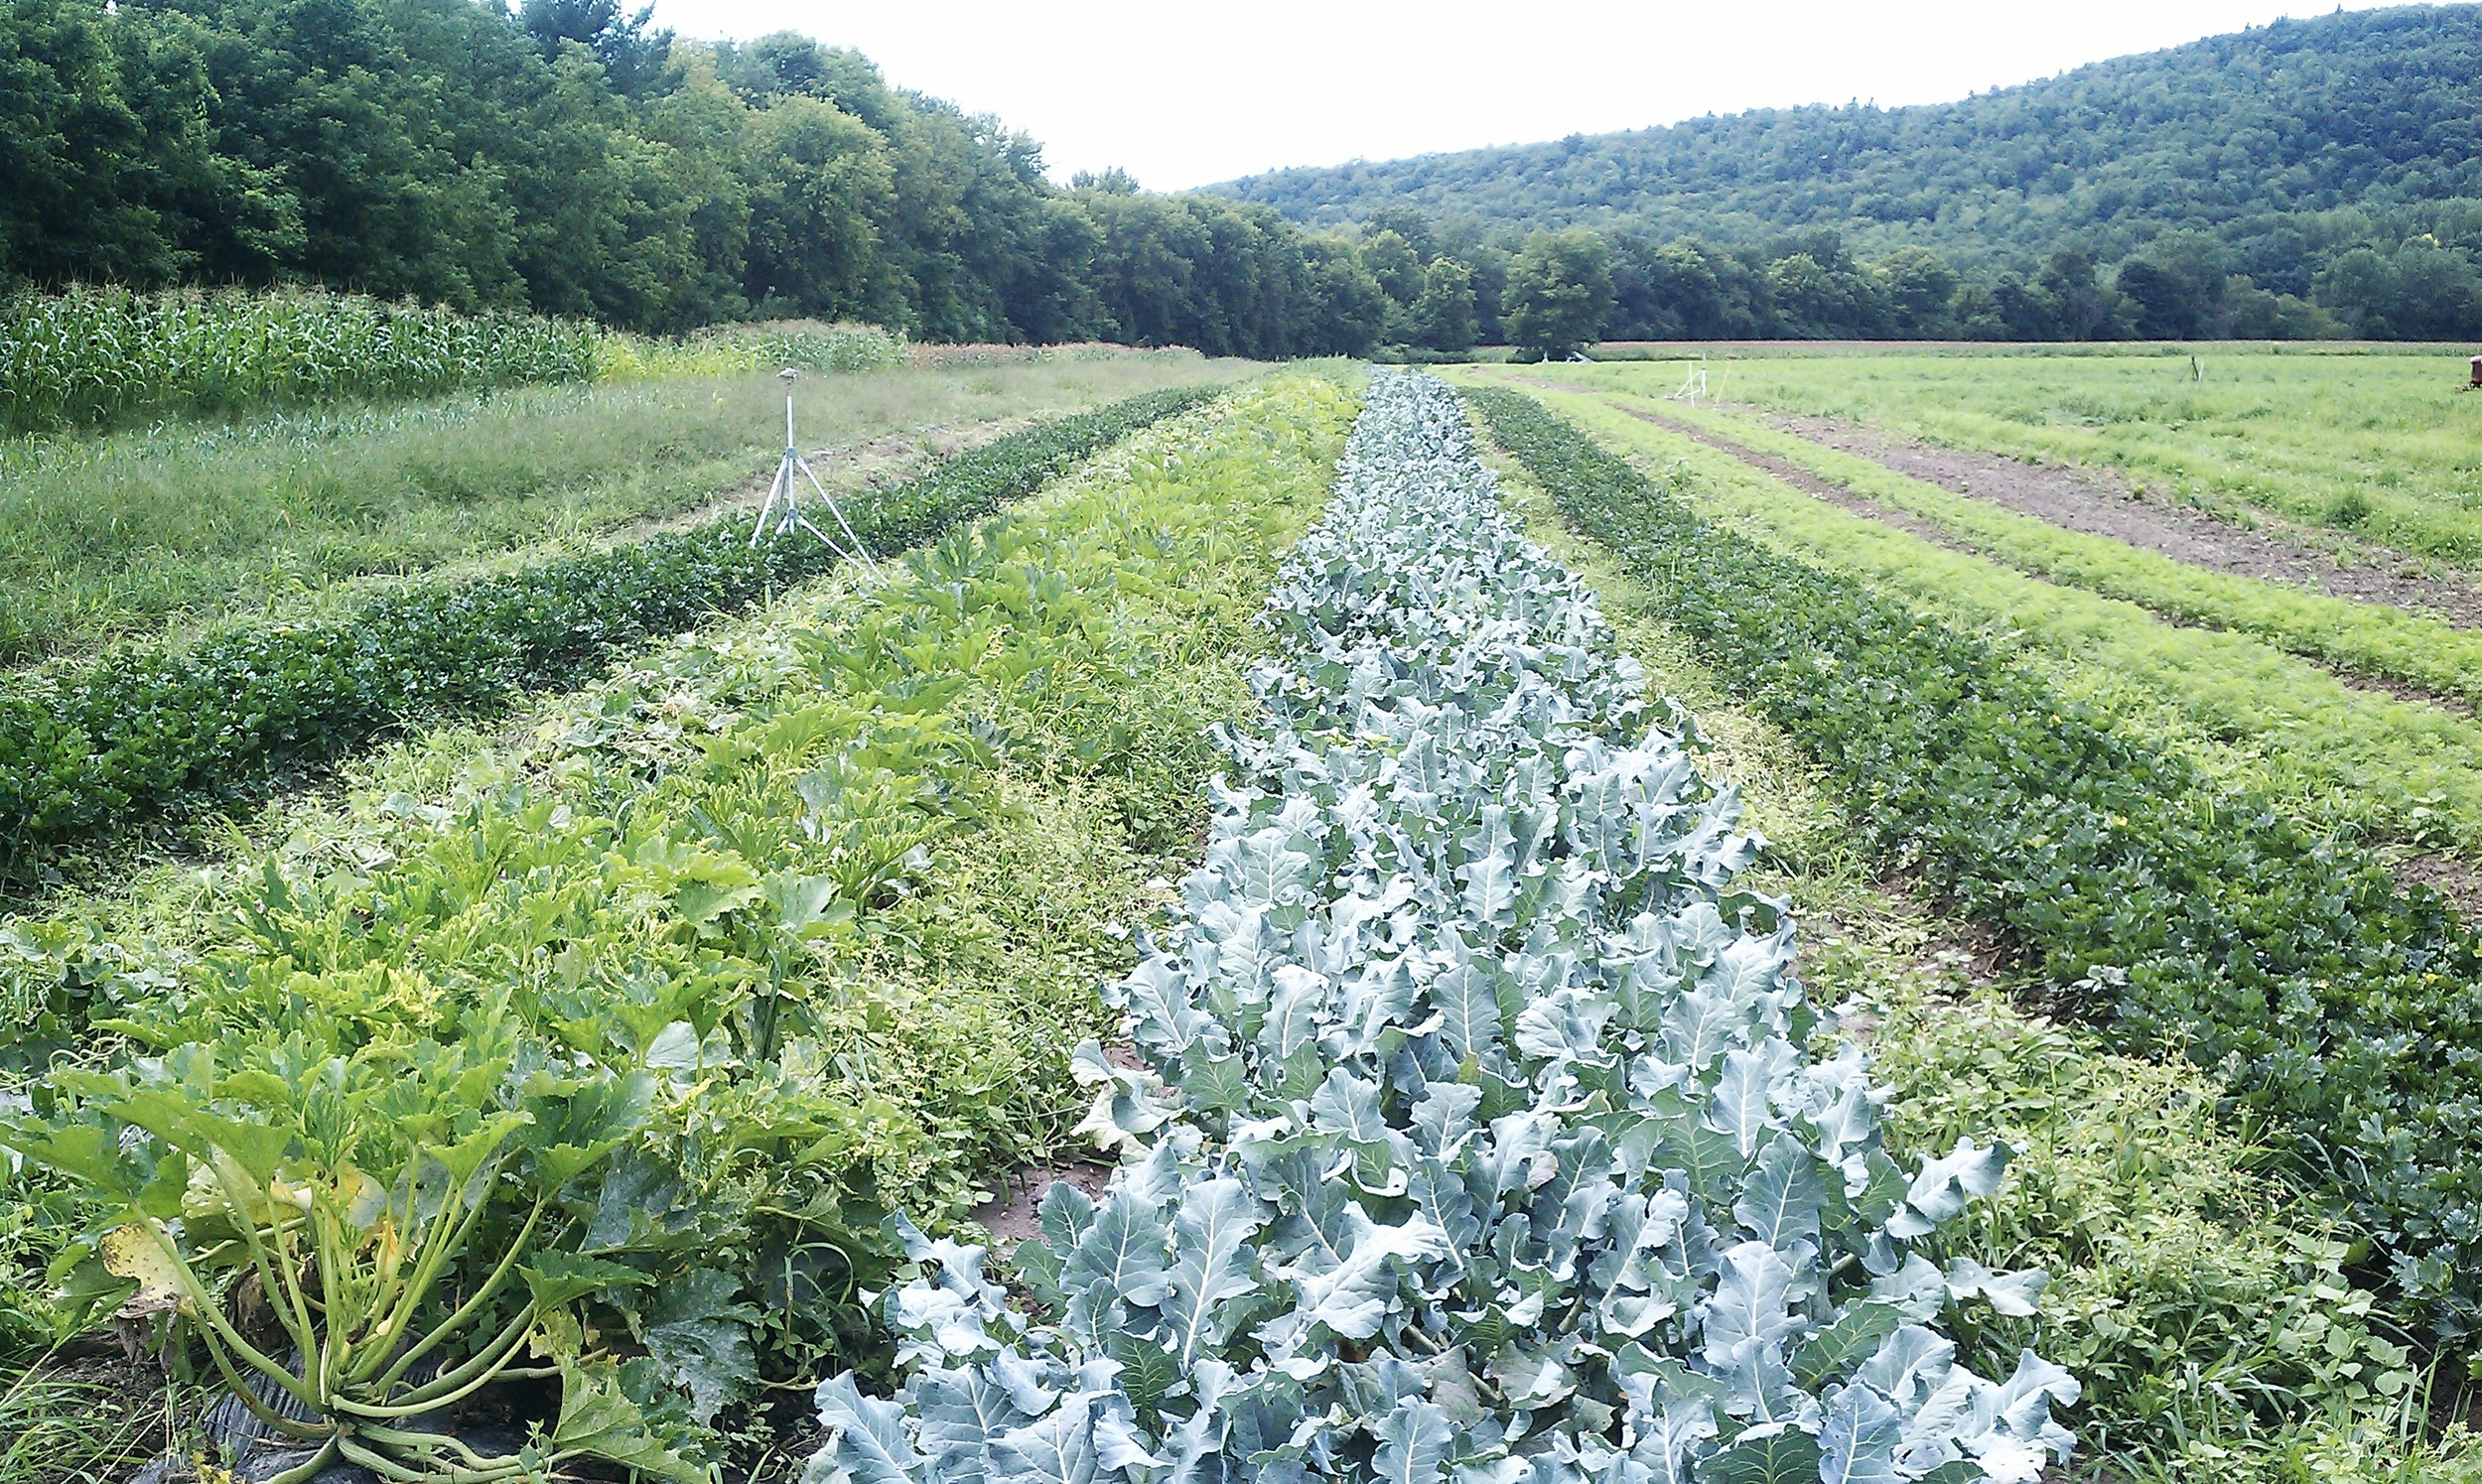 more summer crops